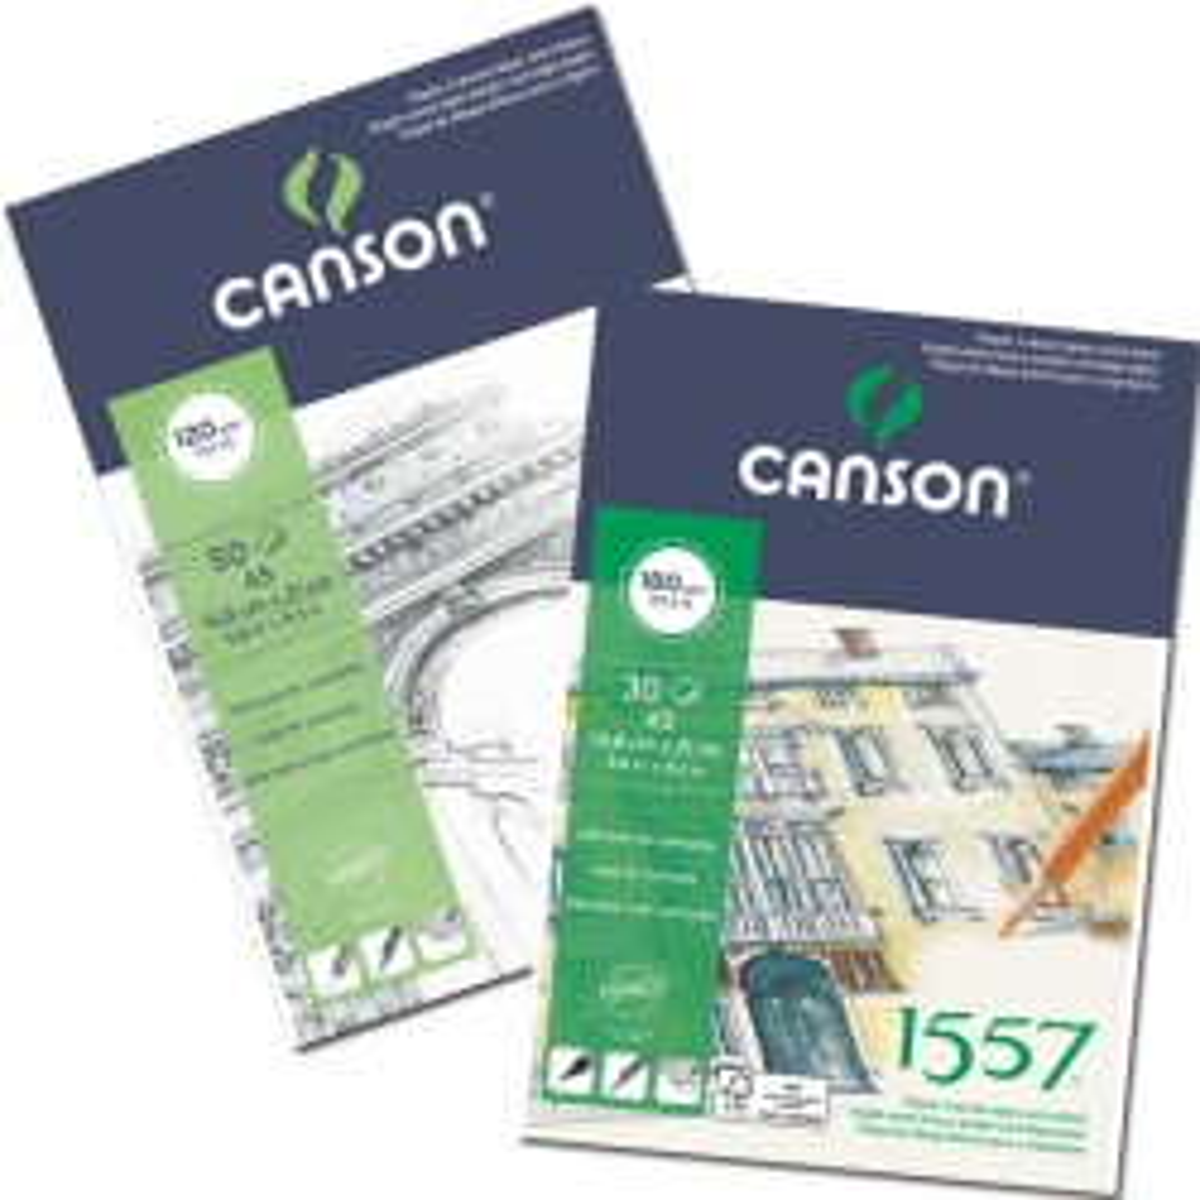 BLOC CANSON 1557 A5 180GR...